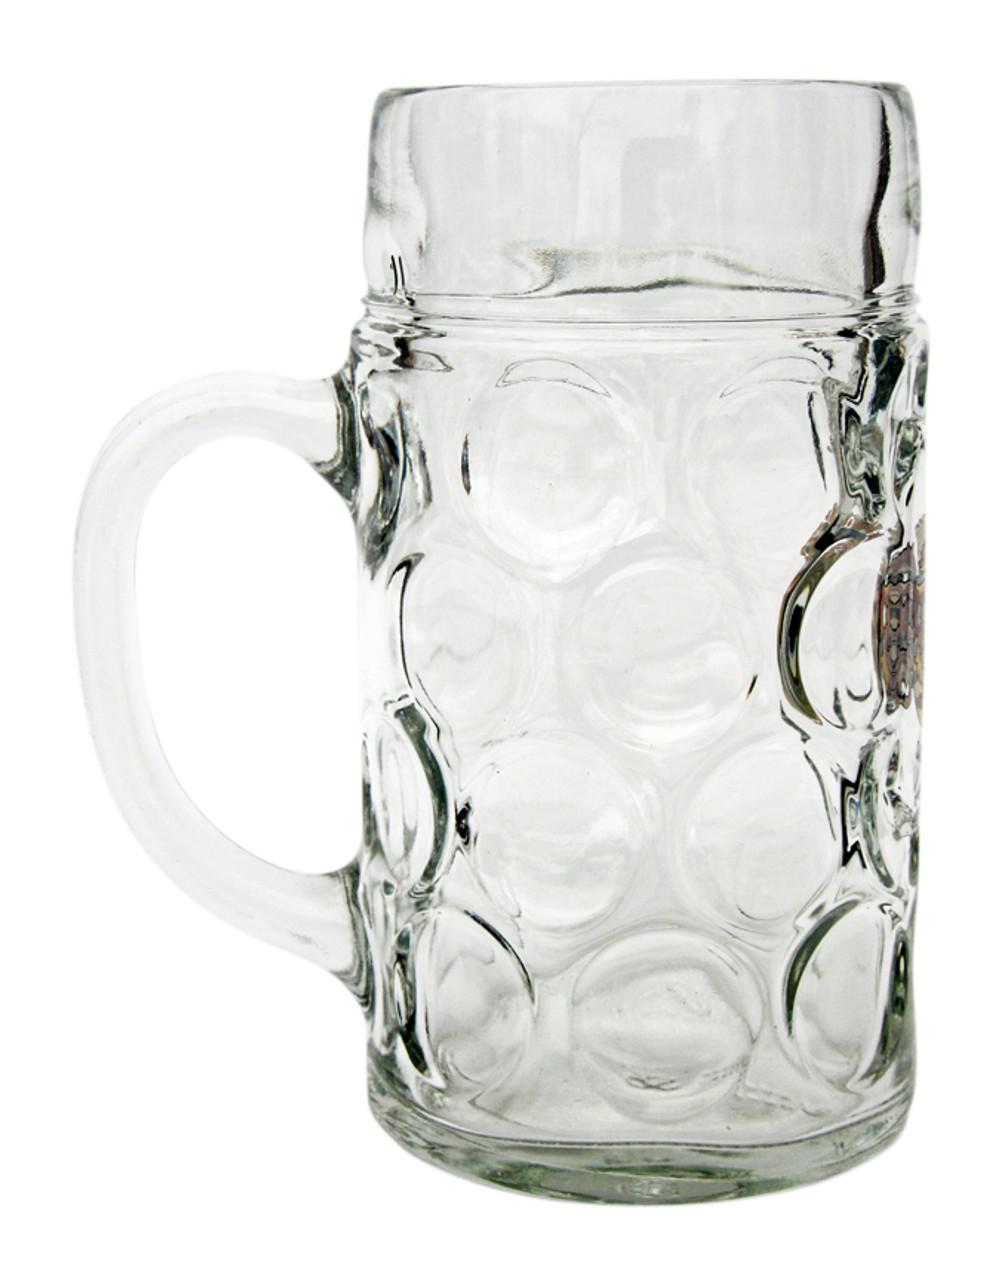 Personalized 1 Liter Rheinland Pfalz Oktoberfest Beer Mug